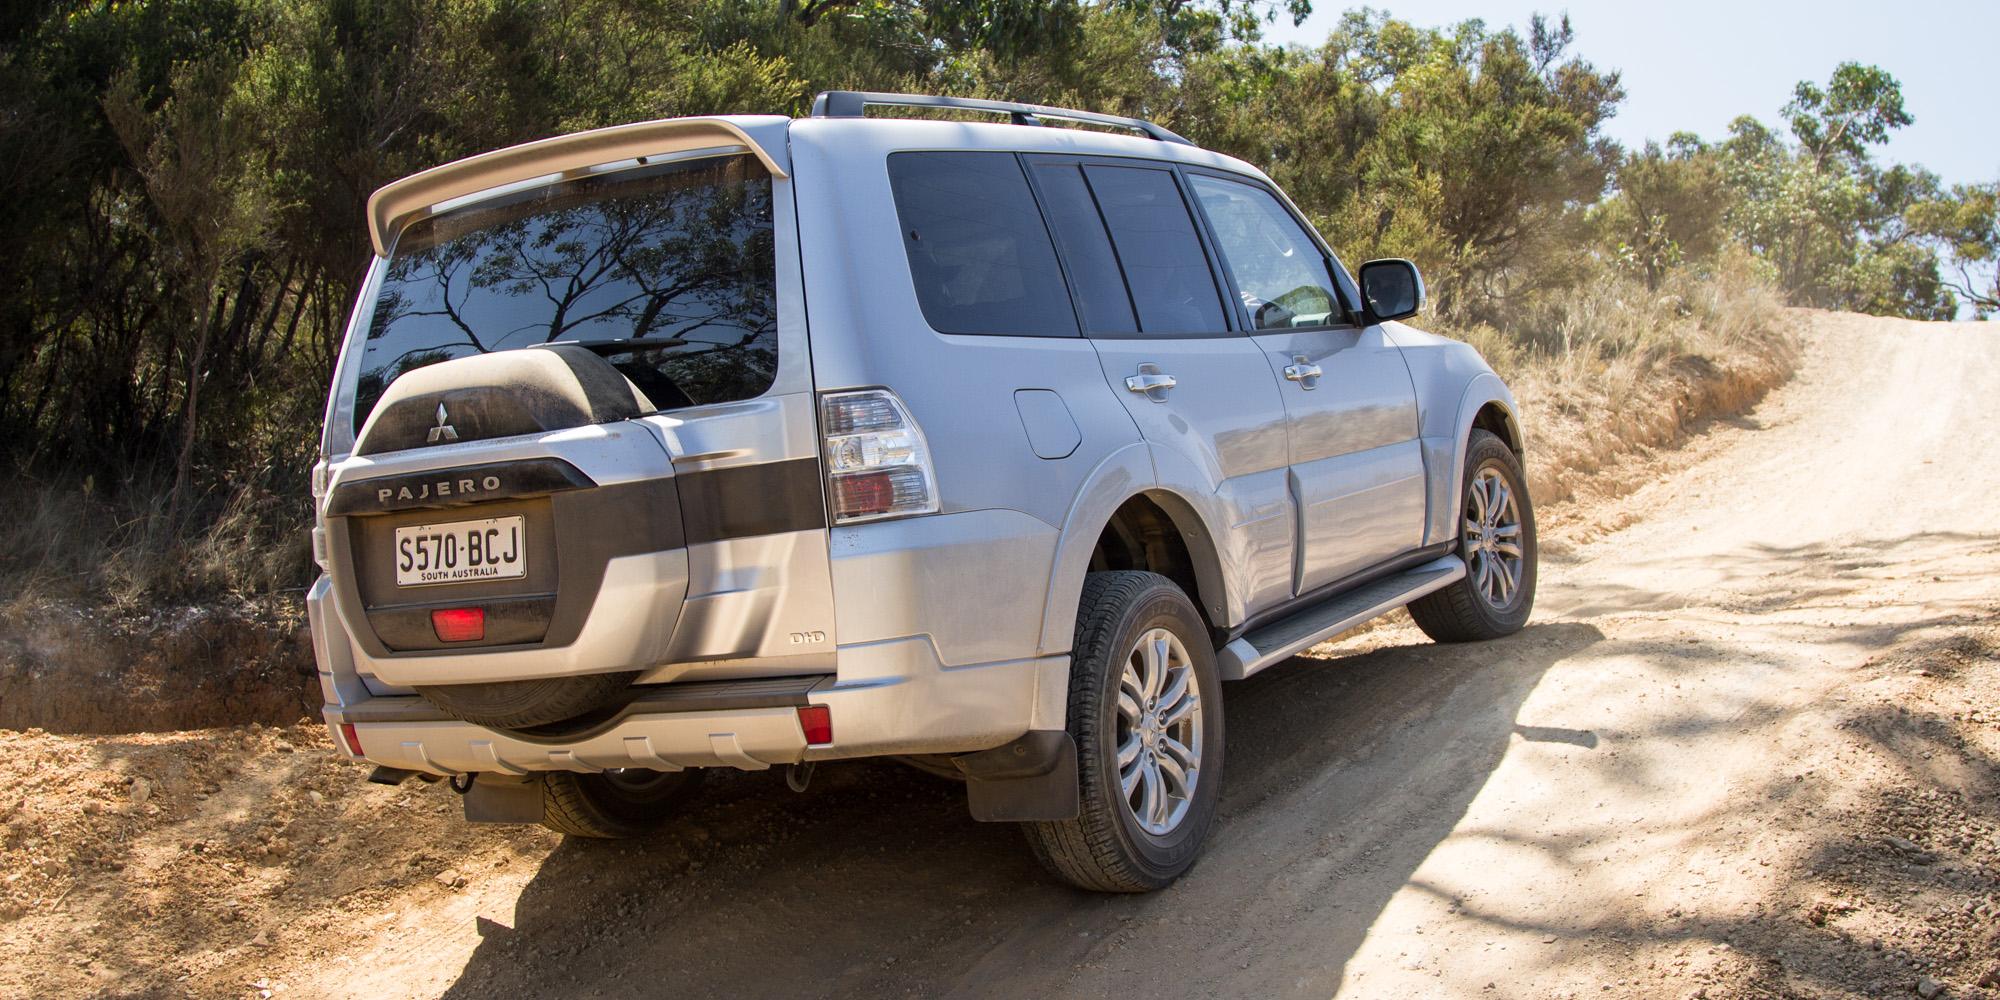 Kelebihan Kekurangan Toyota Pajero Tangguh